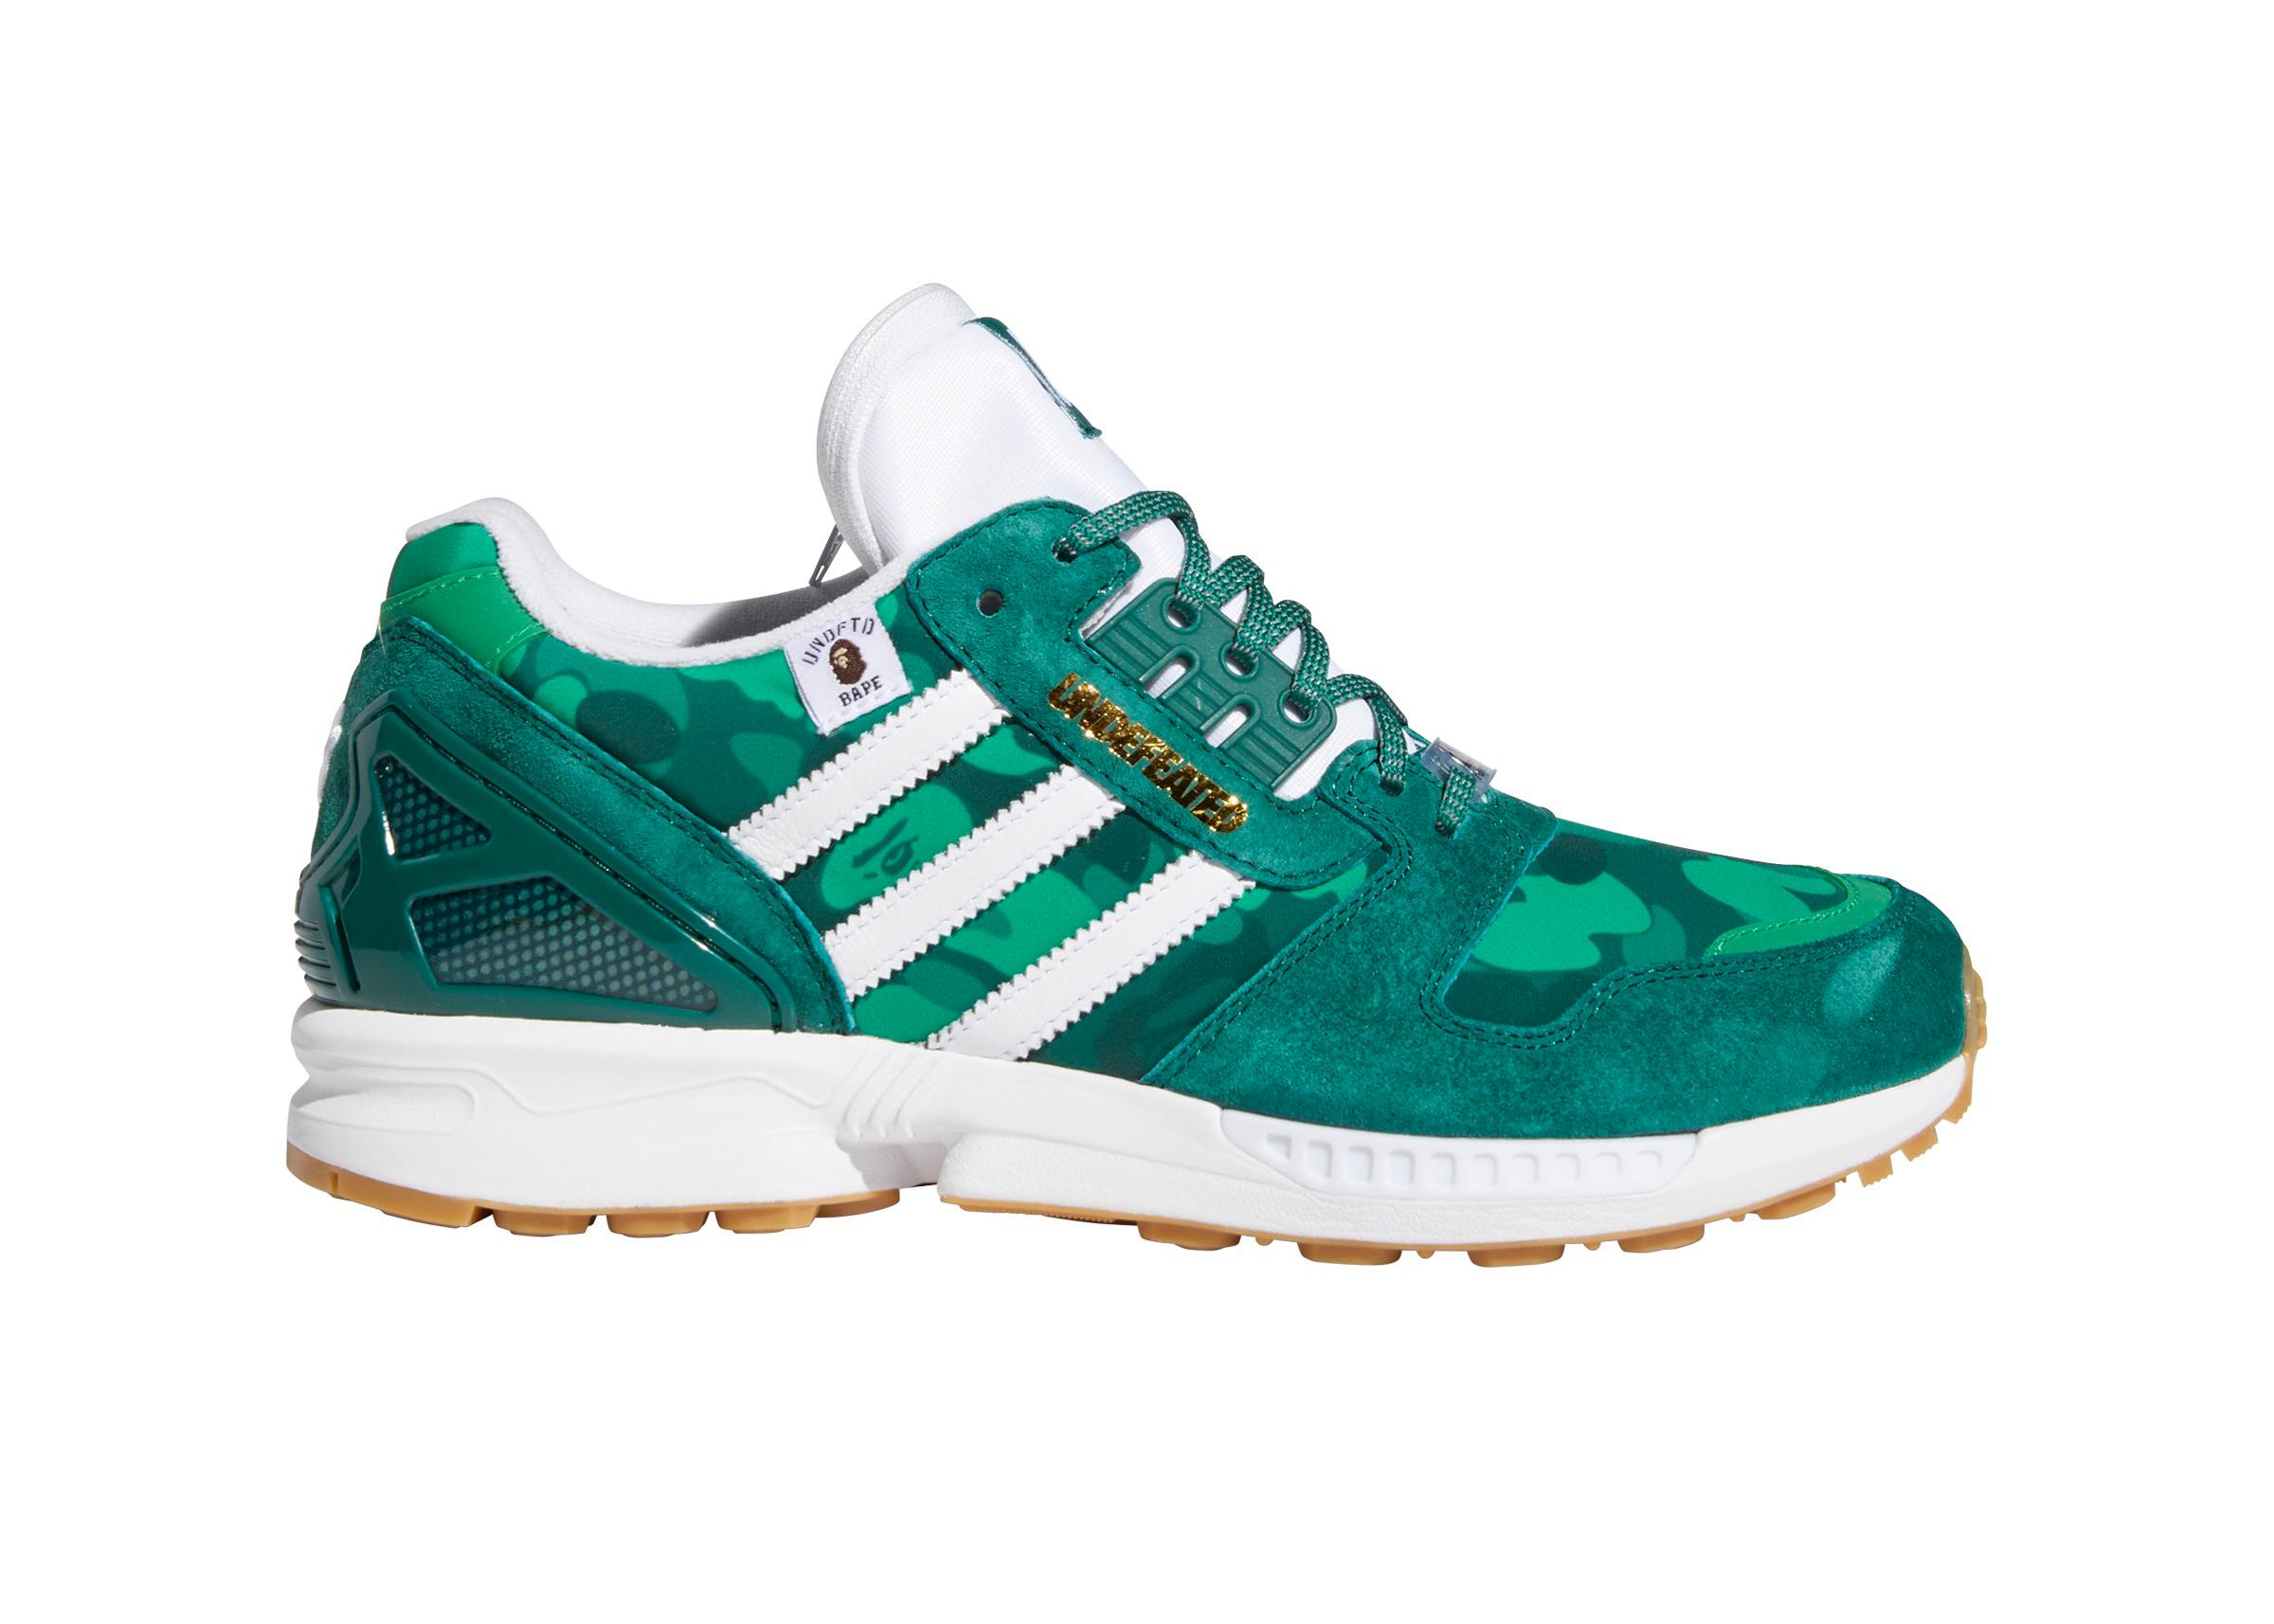 Adidas x BAPE x UNDFTD: A Formula For